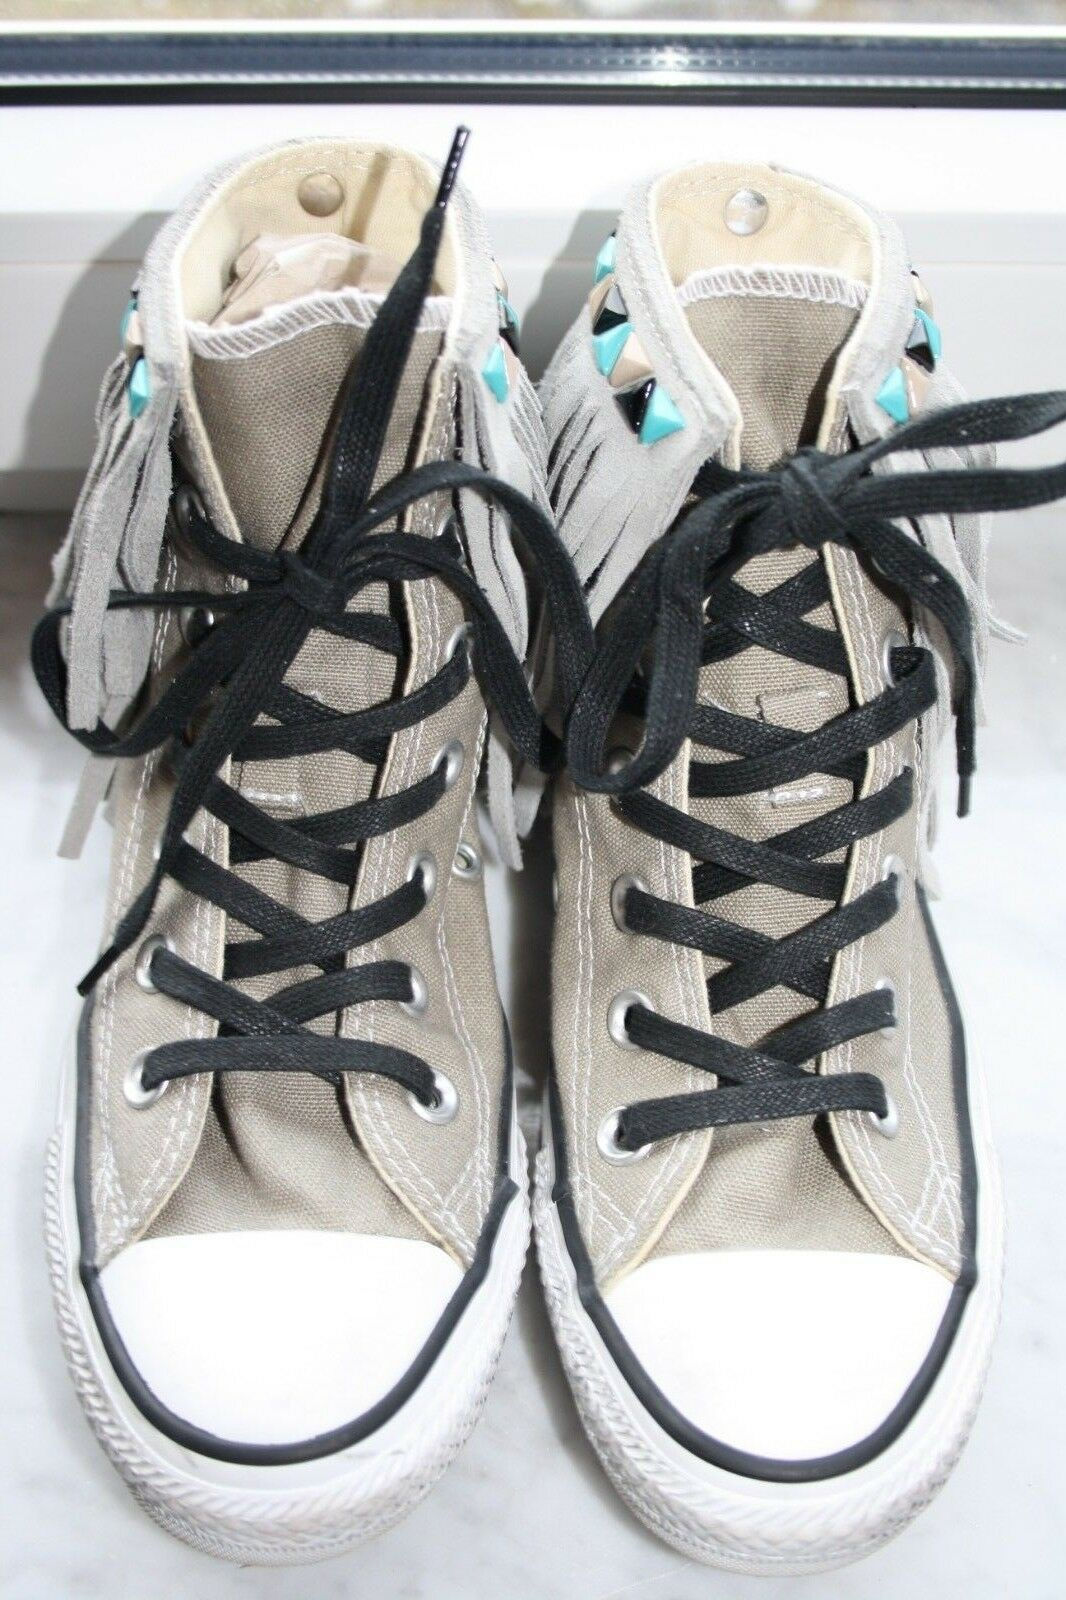 CONVERSE - High Top Sneaker - Leder & Fransen & Leder Indian Look - Gr. 36,5 - TOP ac6d48